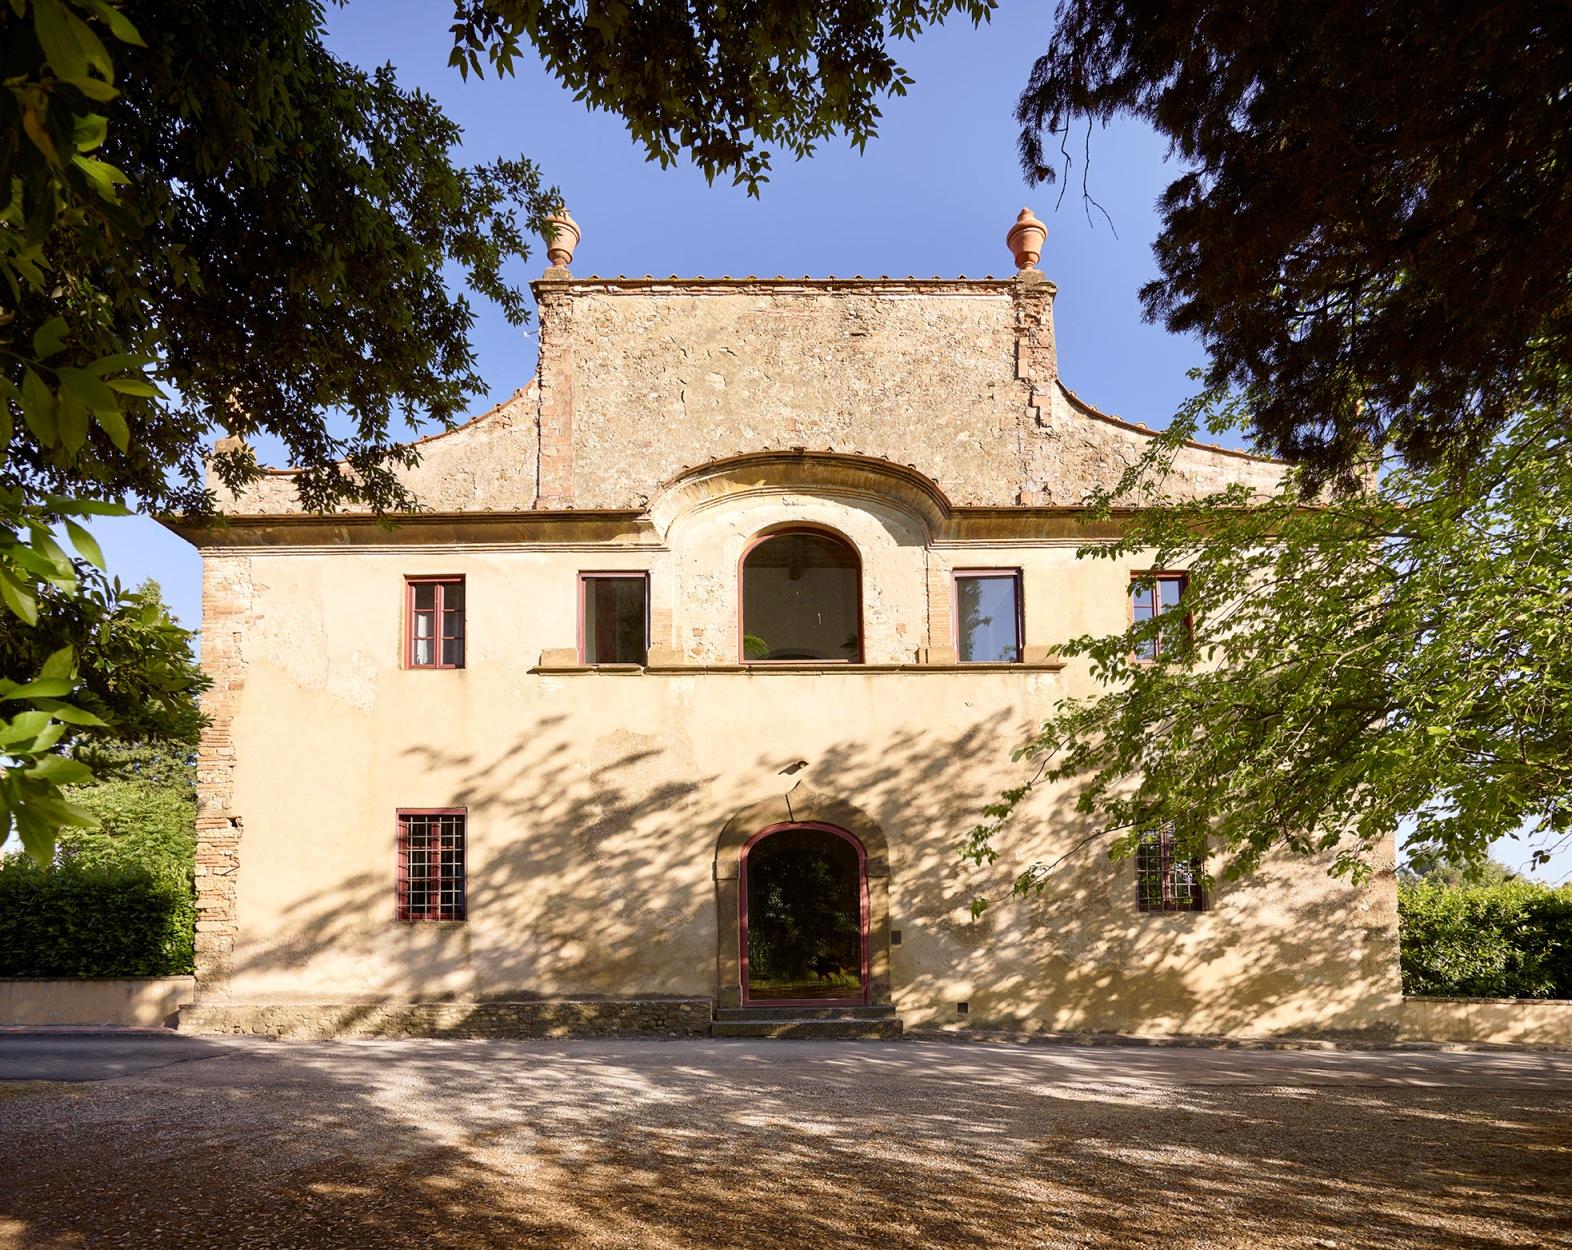 Villa san bartolomeo